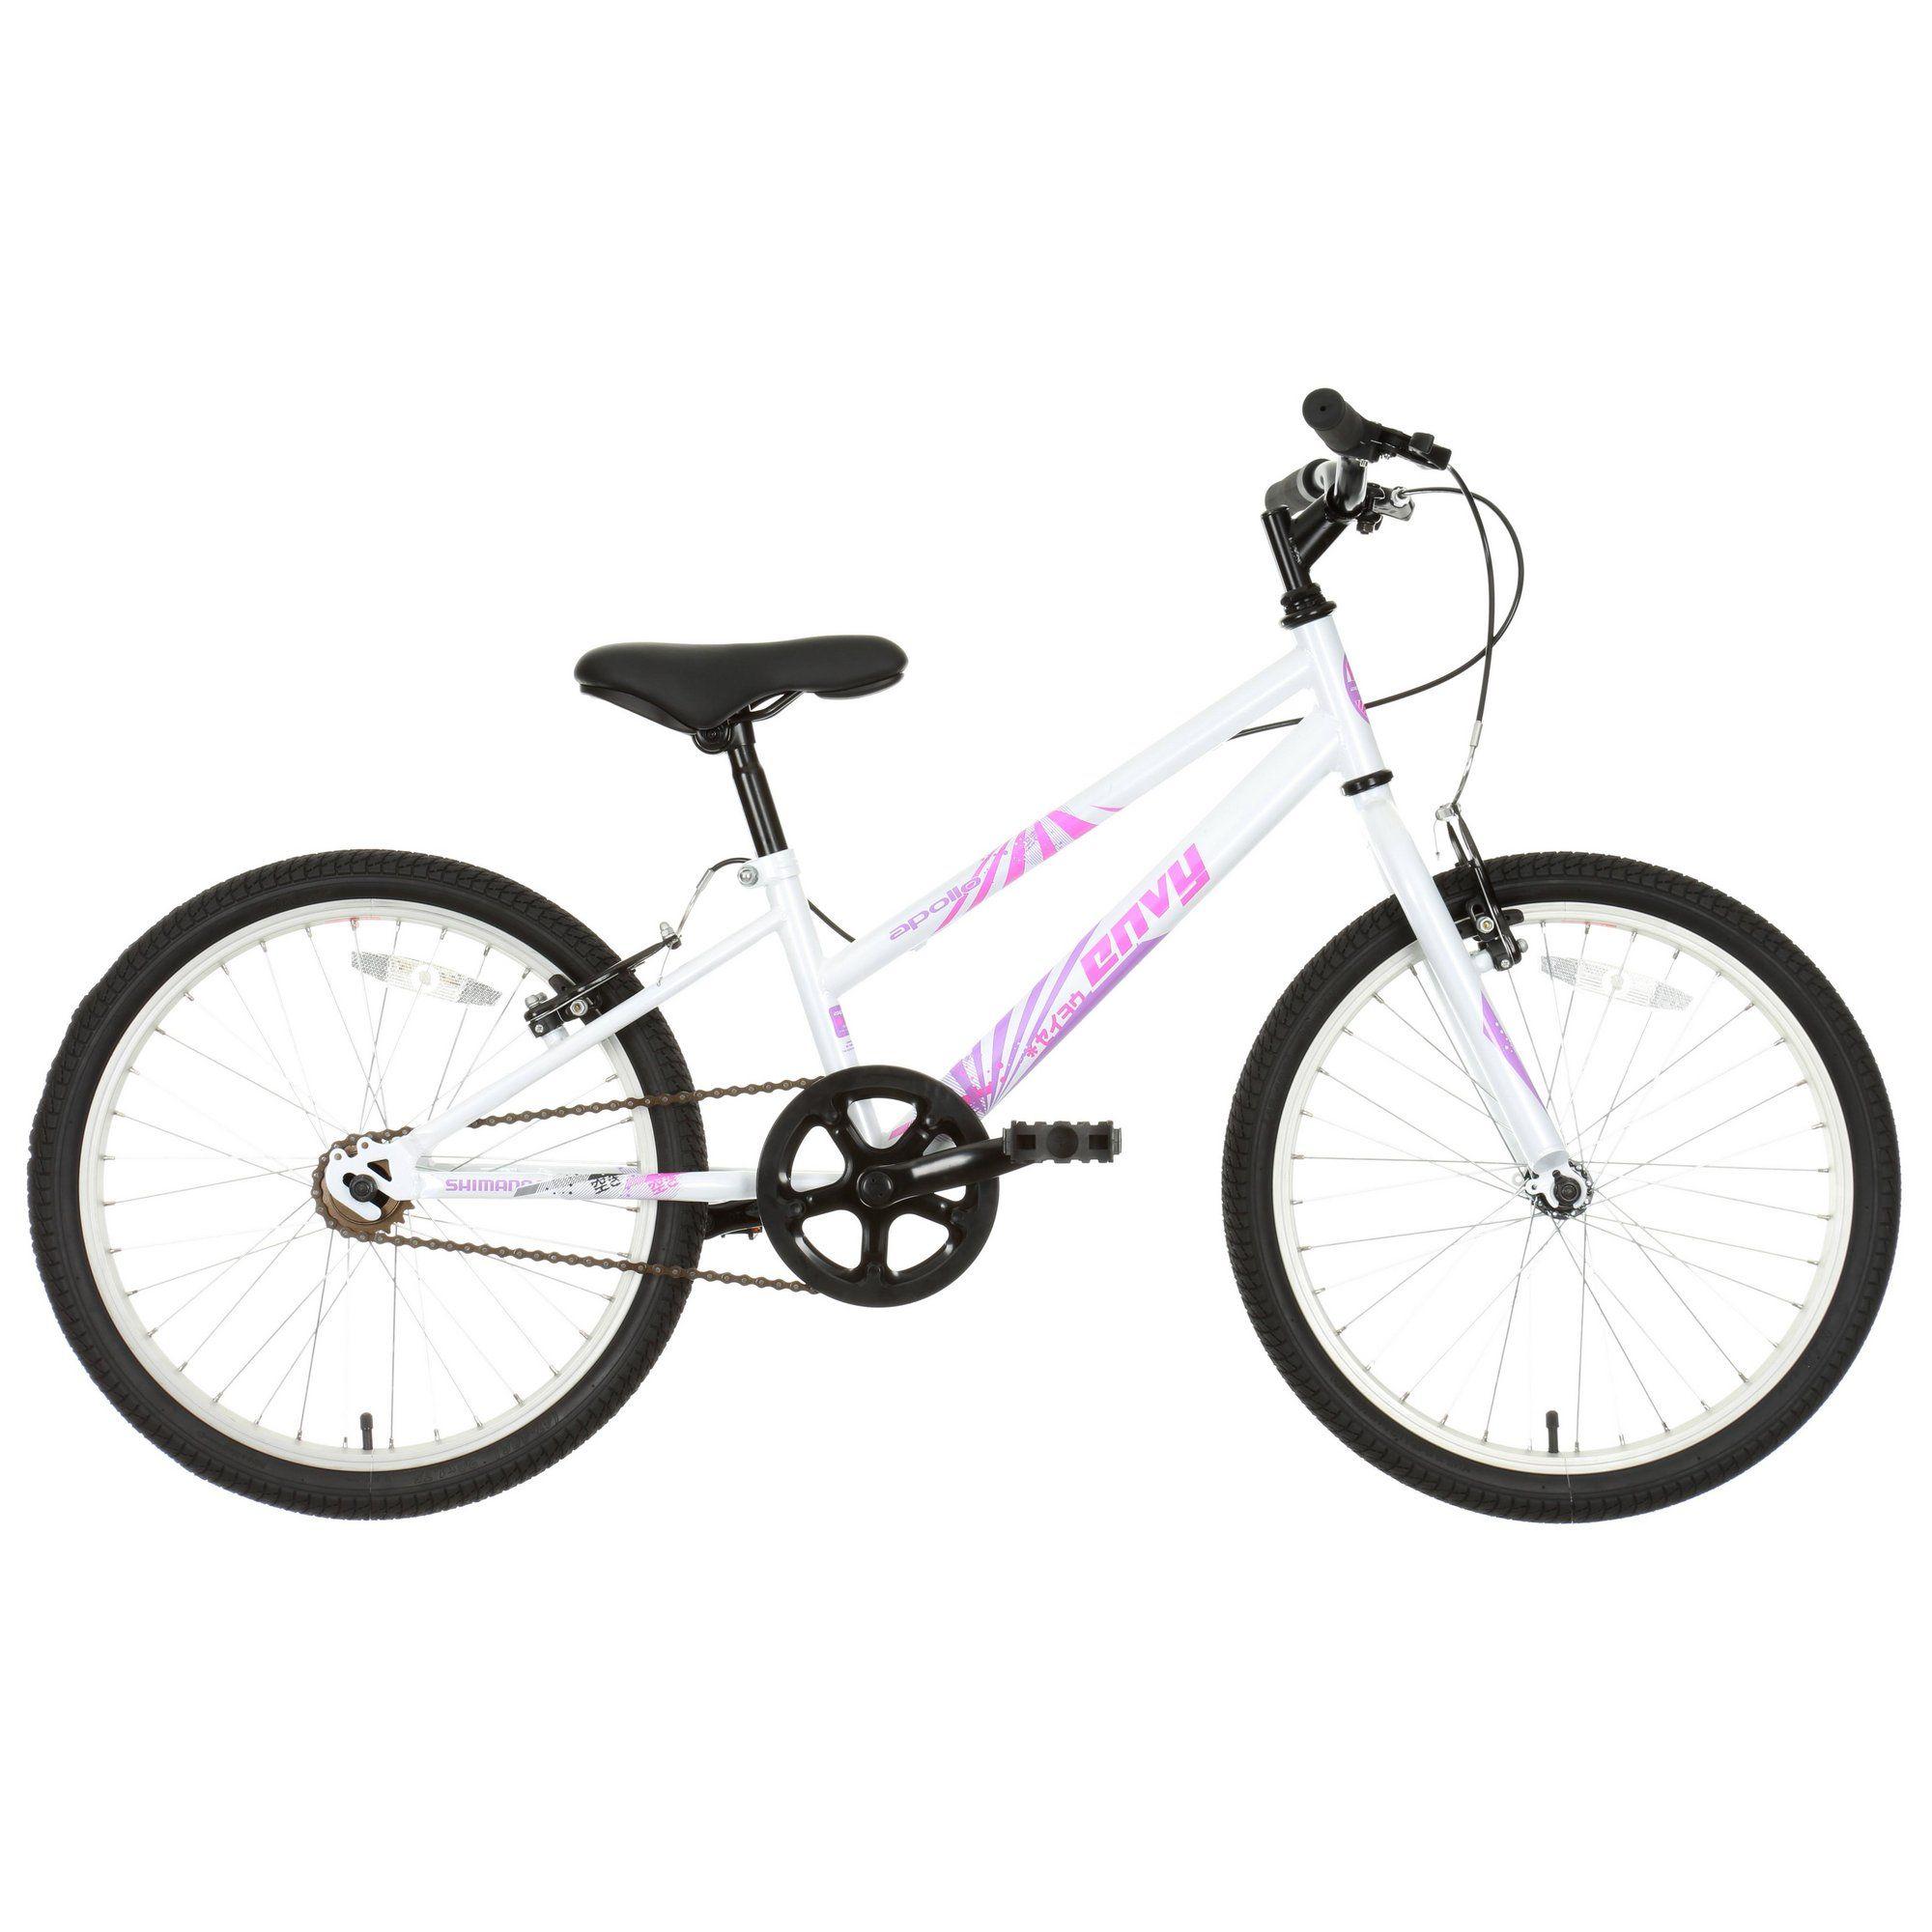 Apollo Envy Girls Hybrid Bike 20 Kids Road Bike Kids Bike Bmx Bikes